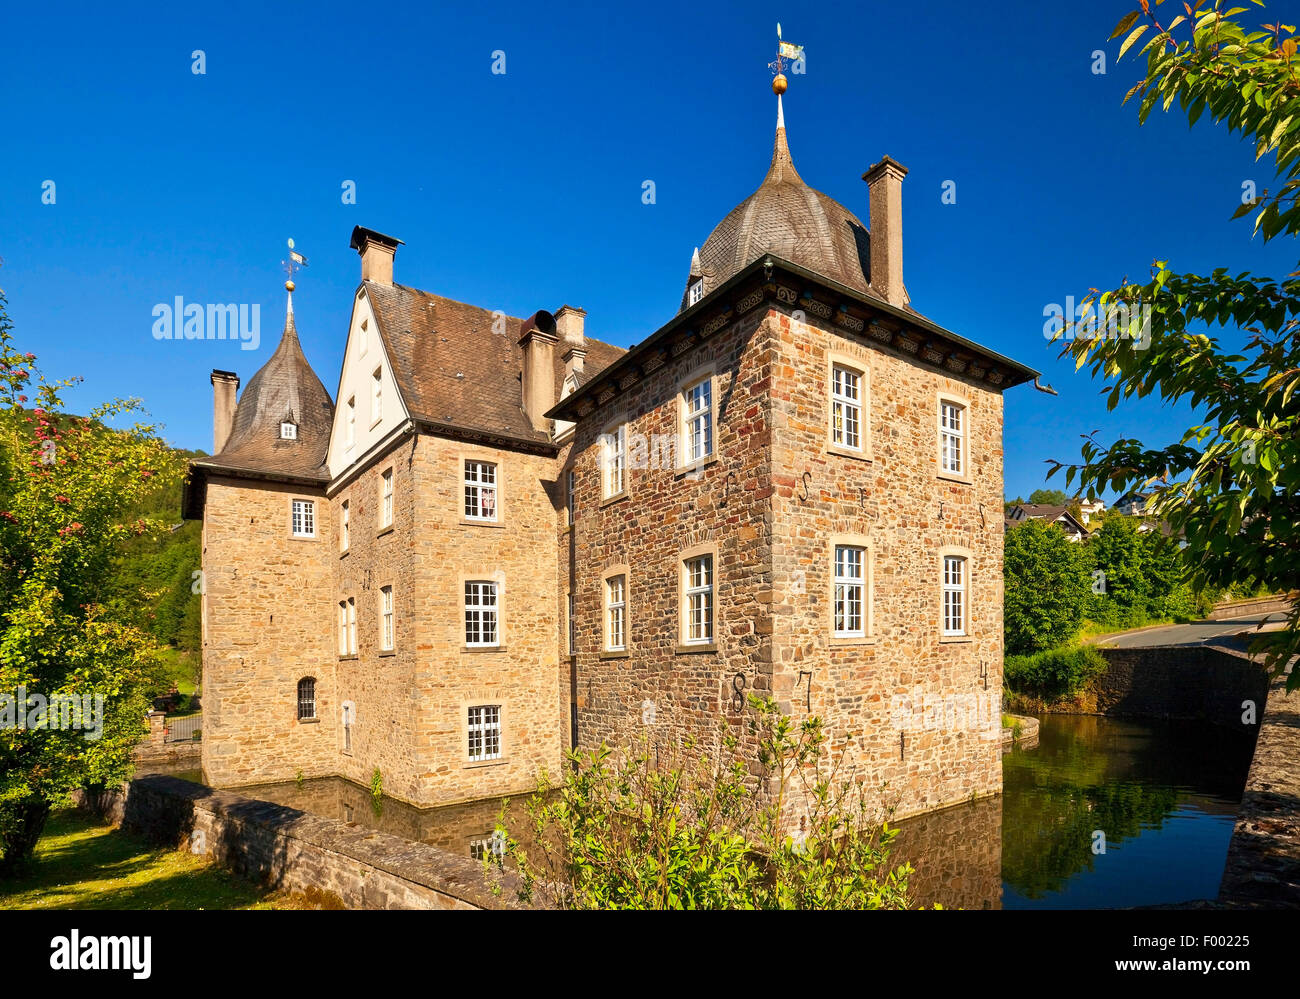 Castle Lenhausen in Finnentrop, Germany, North Rhine-Westphalia, Sauerland, Finnentrop - Stock Image